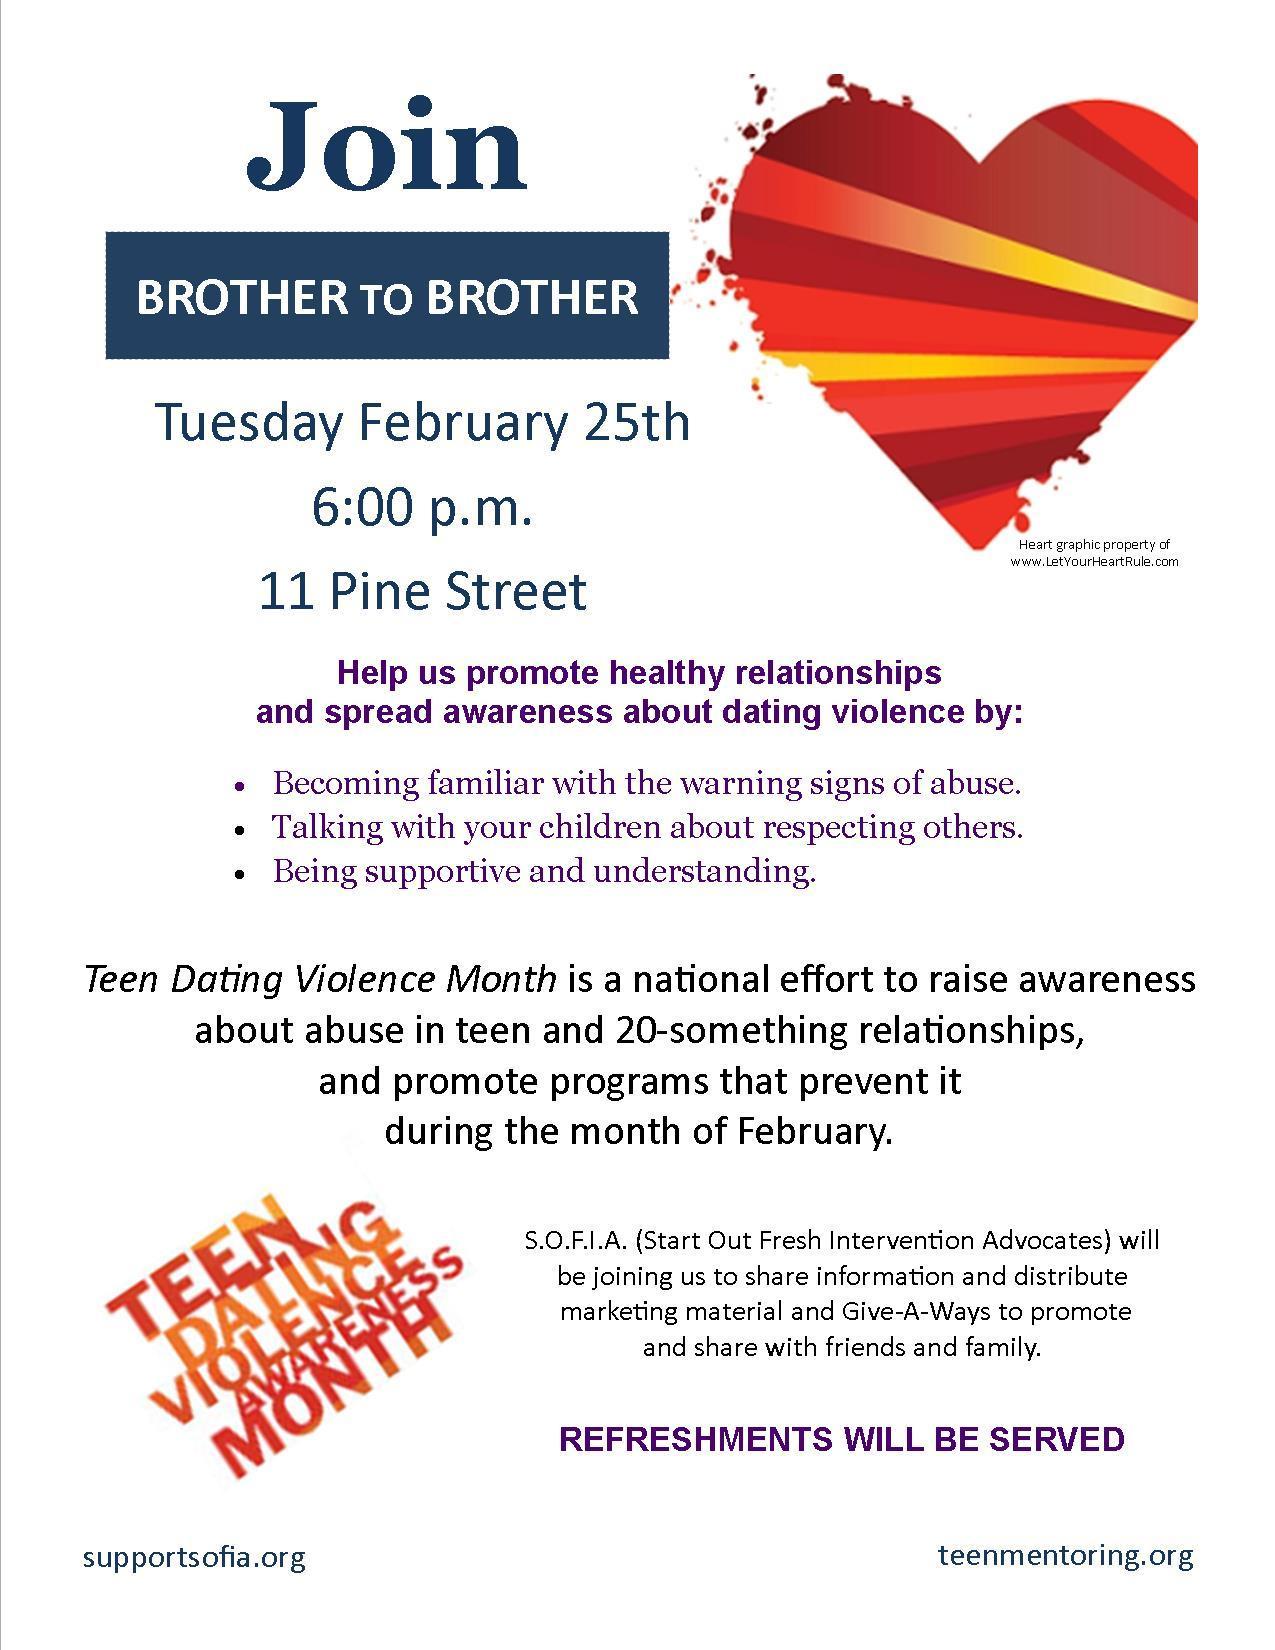 0eddb0f9762ad9a8e08b_Teen_Dating_Violence_Prevention_Flyer2013FINAL__2_.jpg